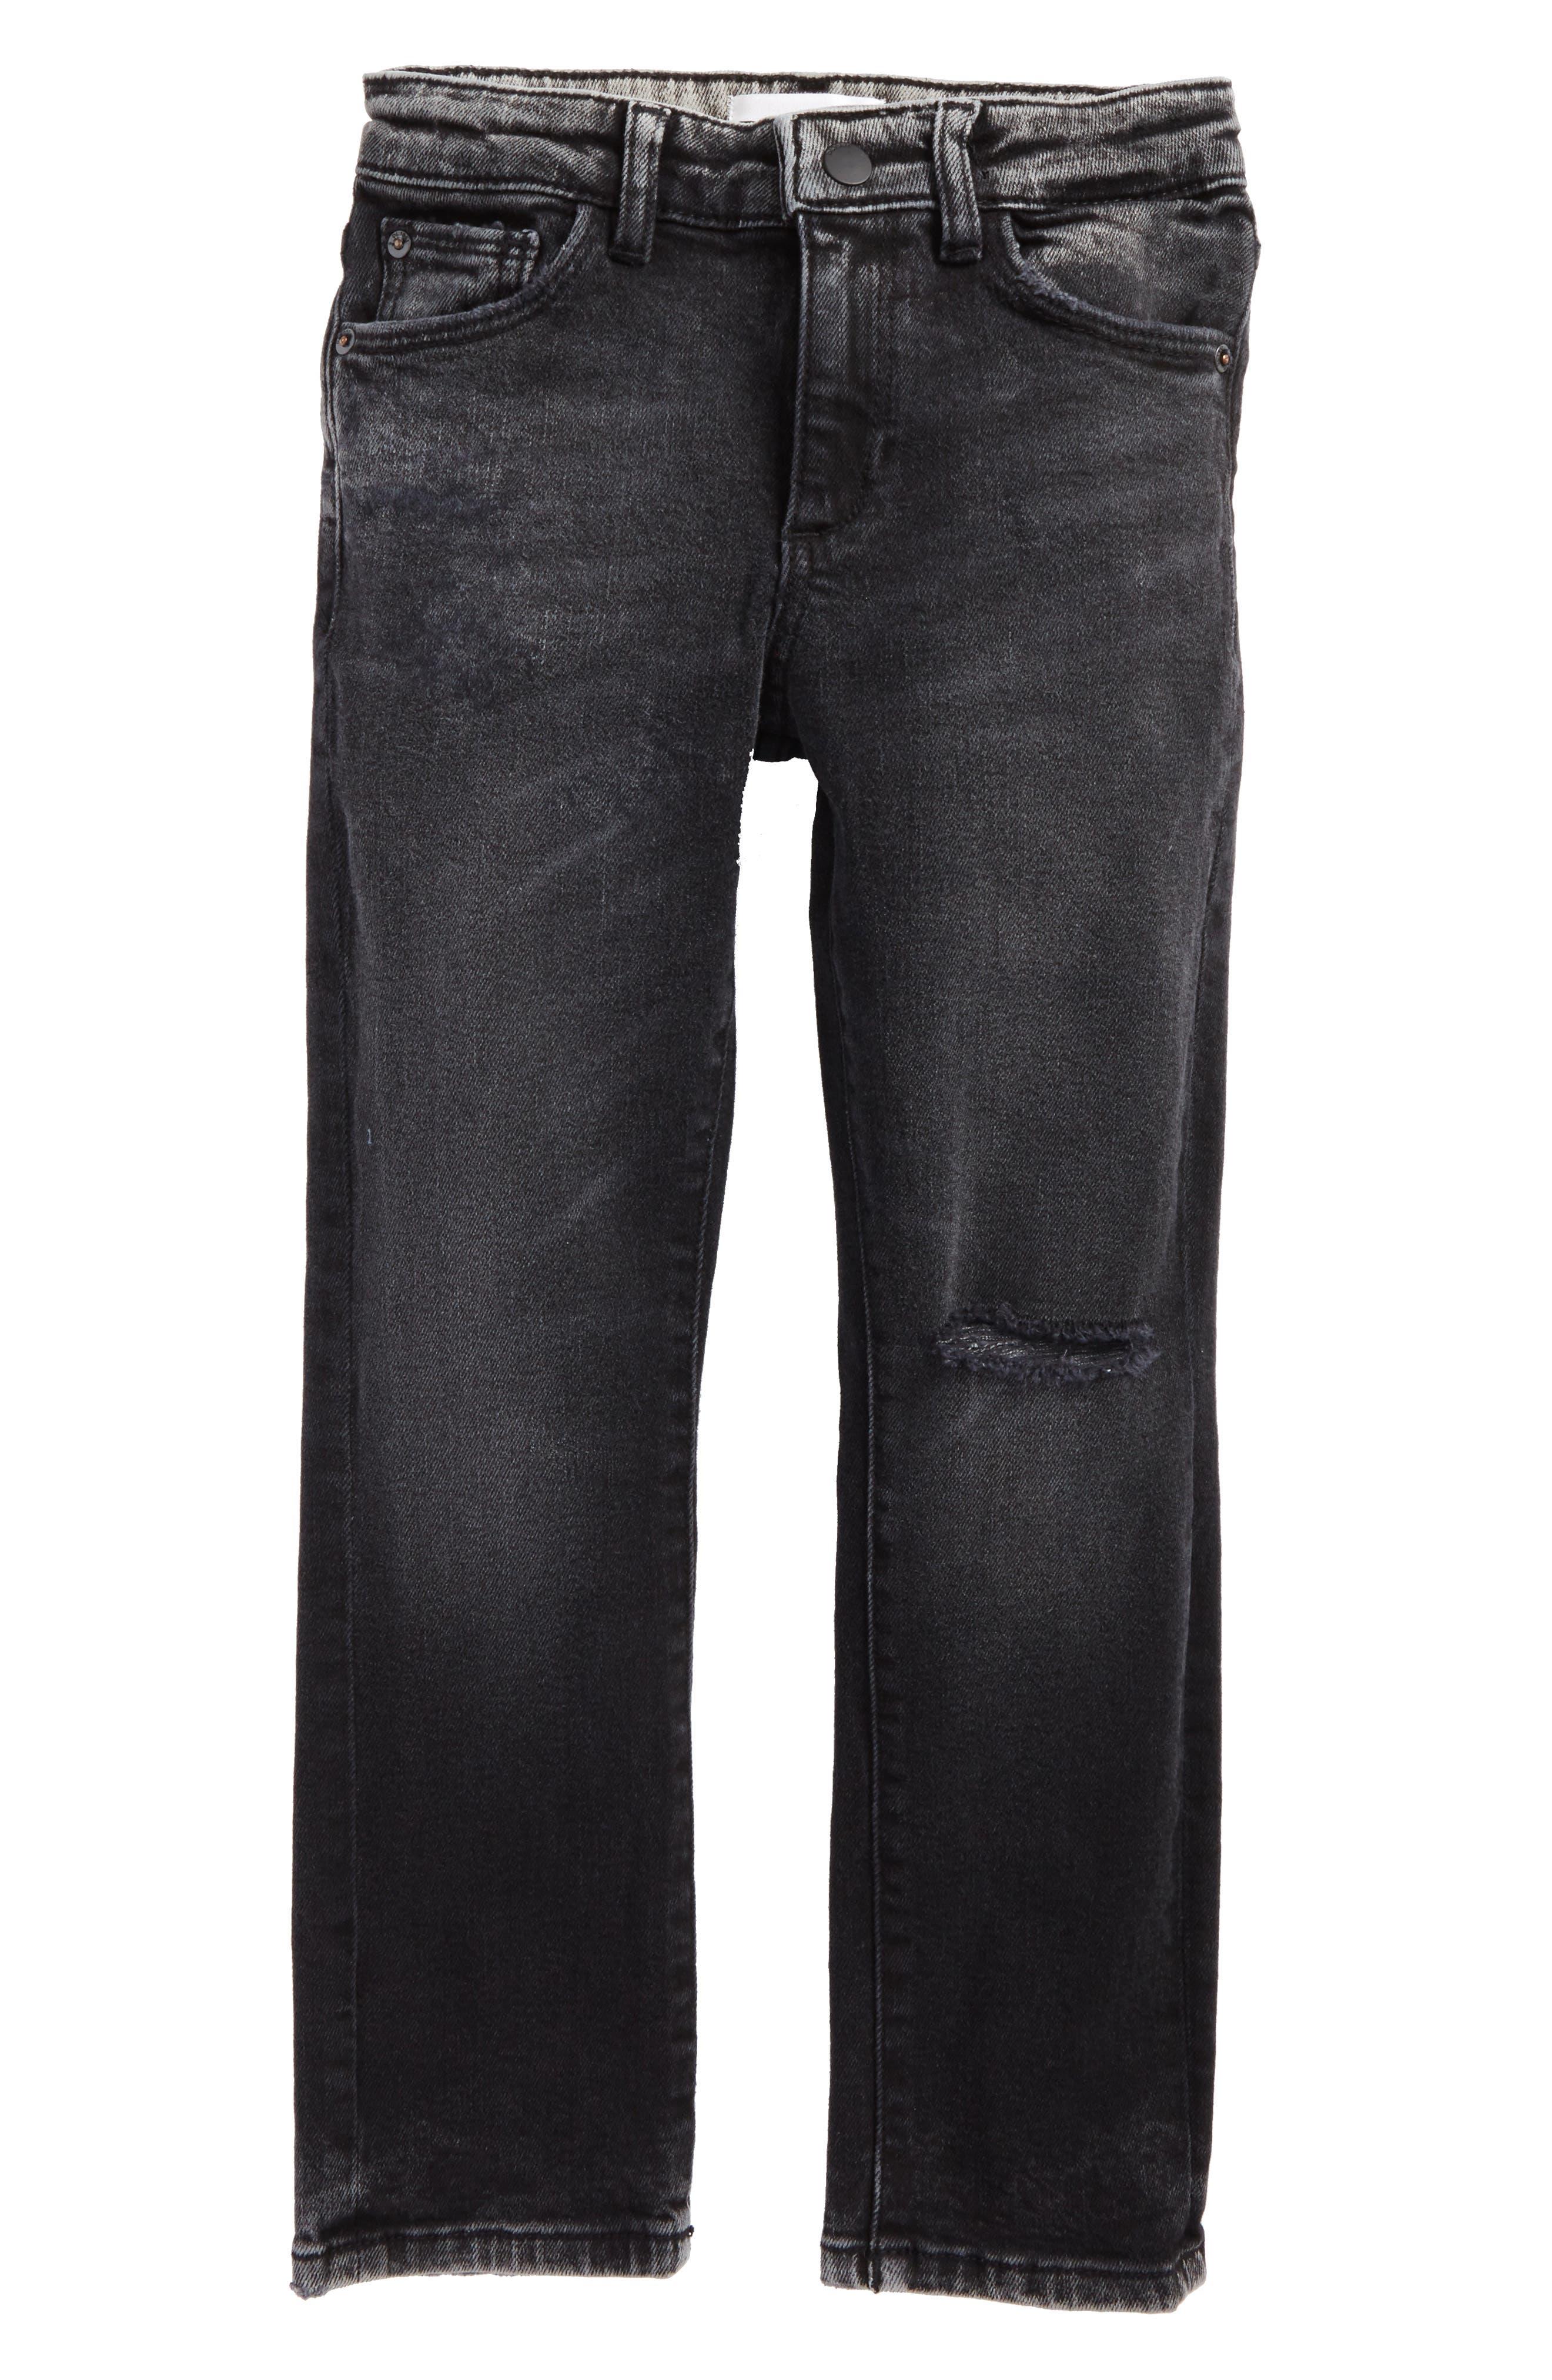 Hawke Skinny Jeans,                             Main thumbnail 1, color,                             020